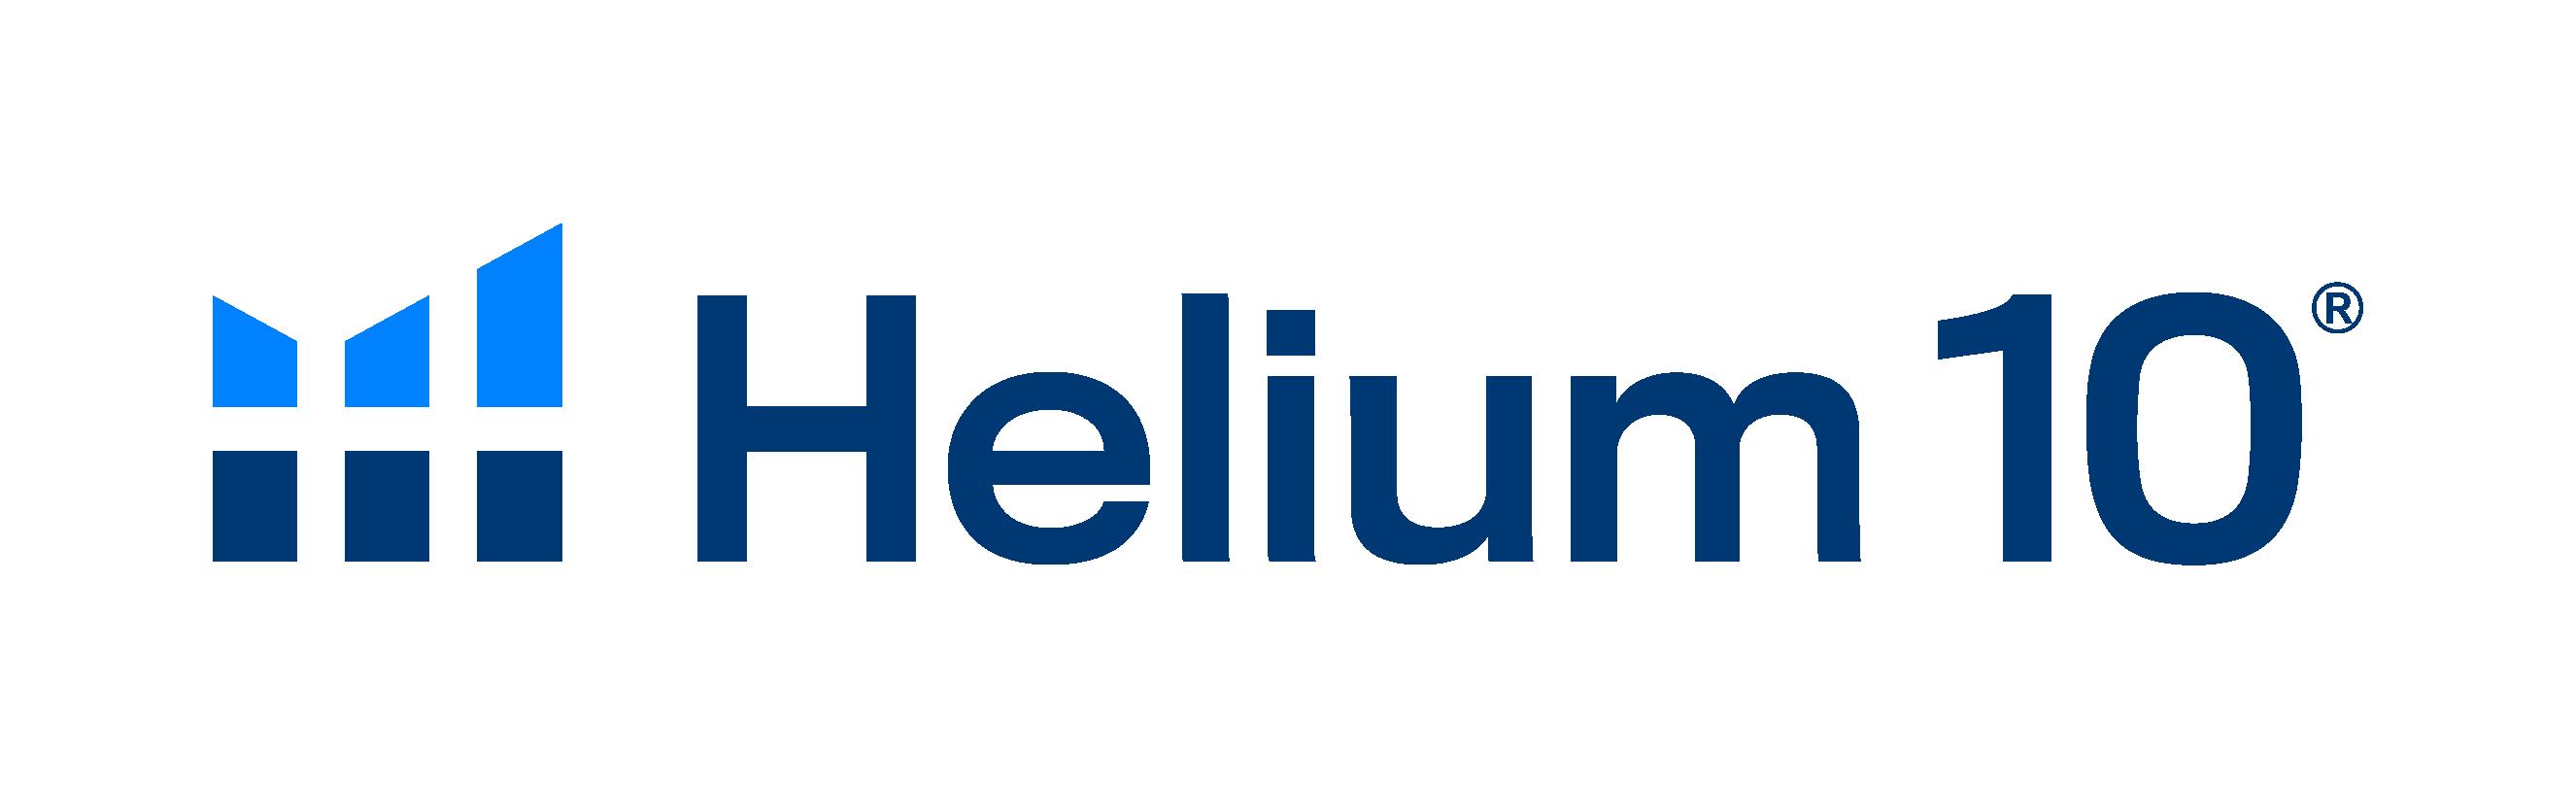 Helium 10 Scribbles Anleitung